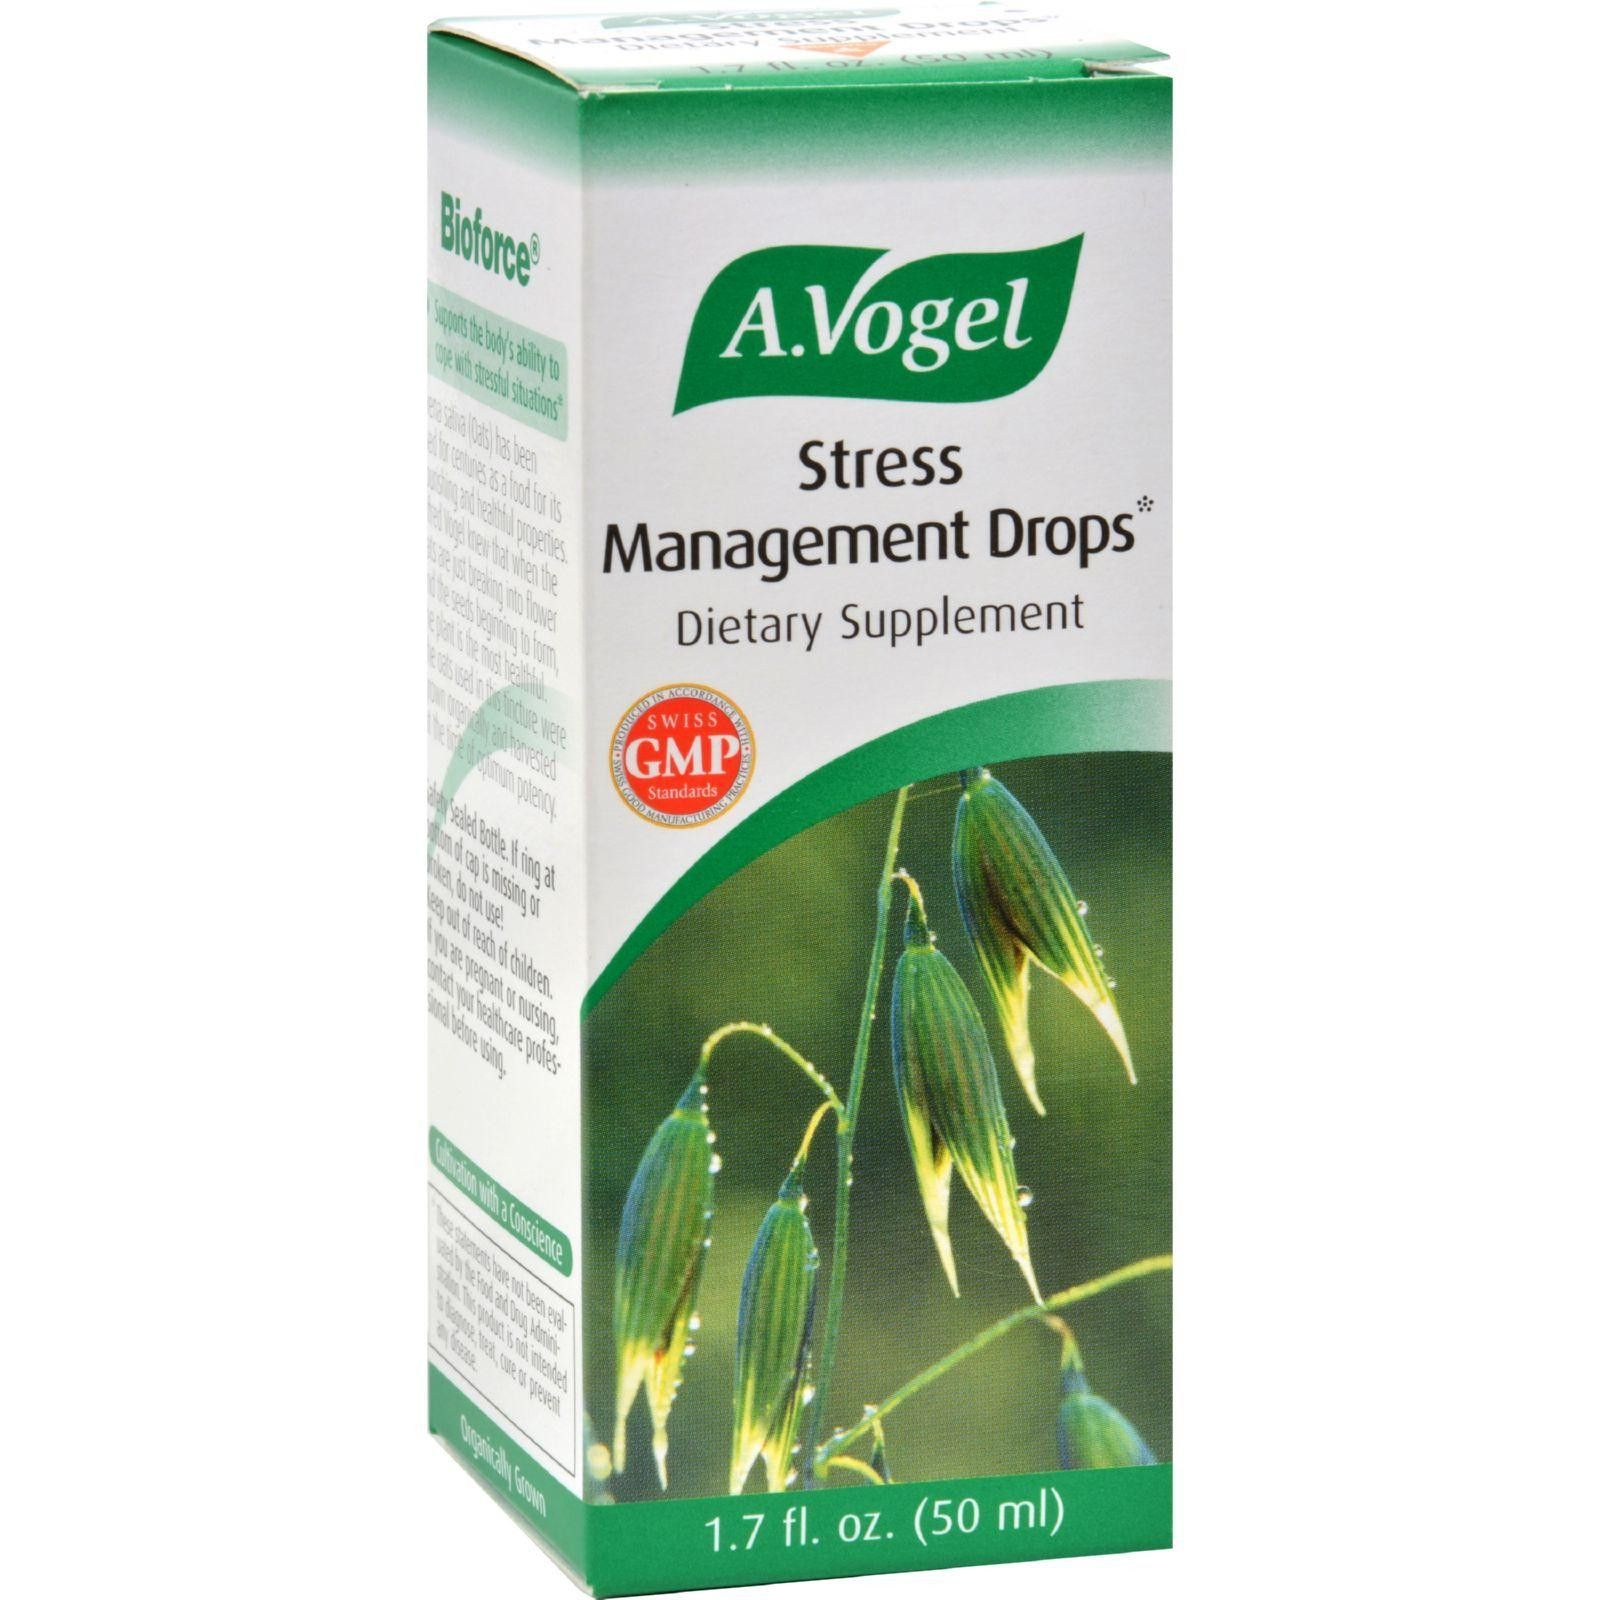 A Vogel Stress Management Drops